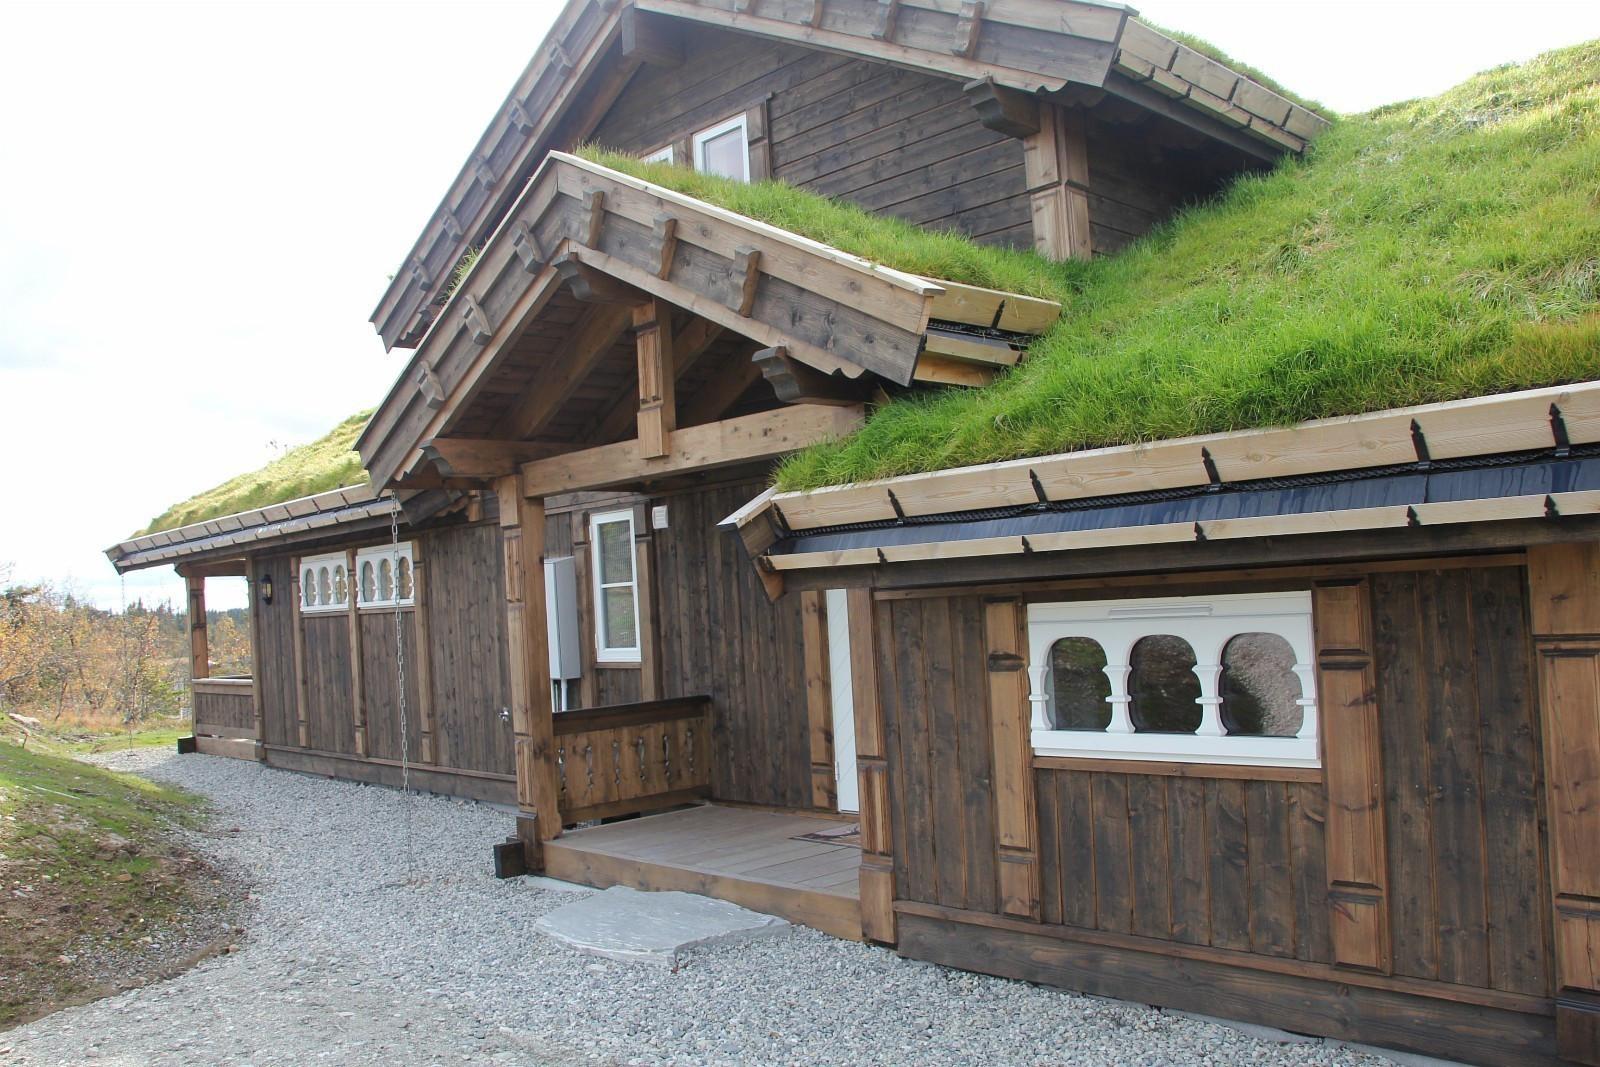 Bilde fra en tilsvarende hytte - kundetilpasninger kan forekomme.